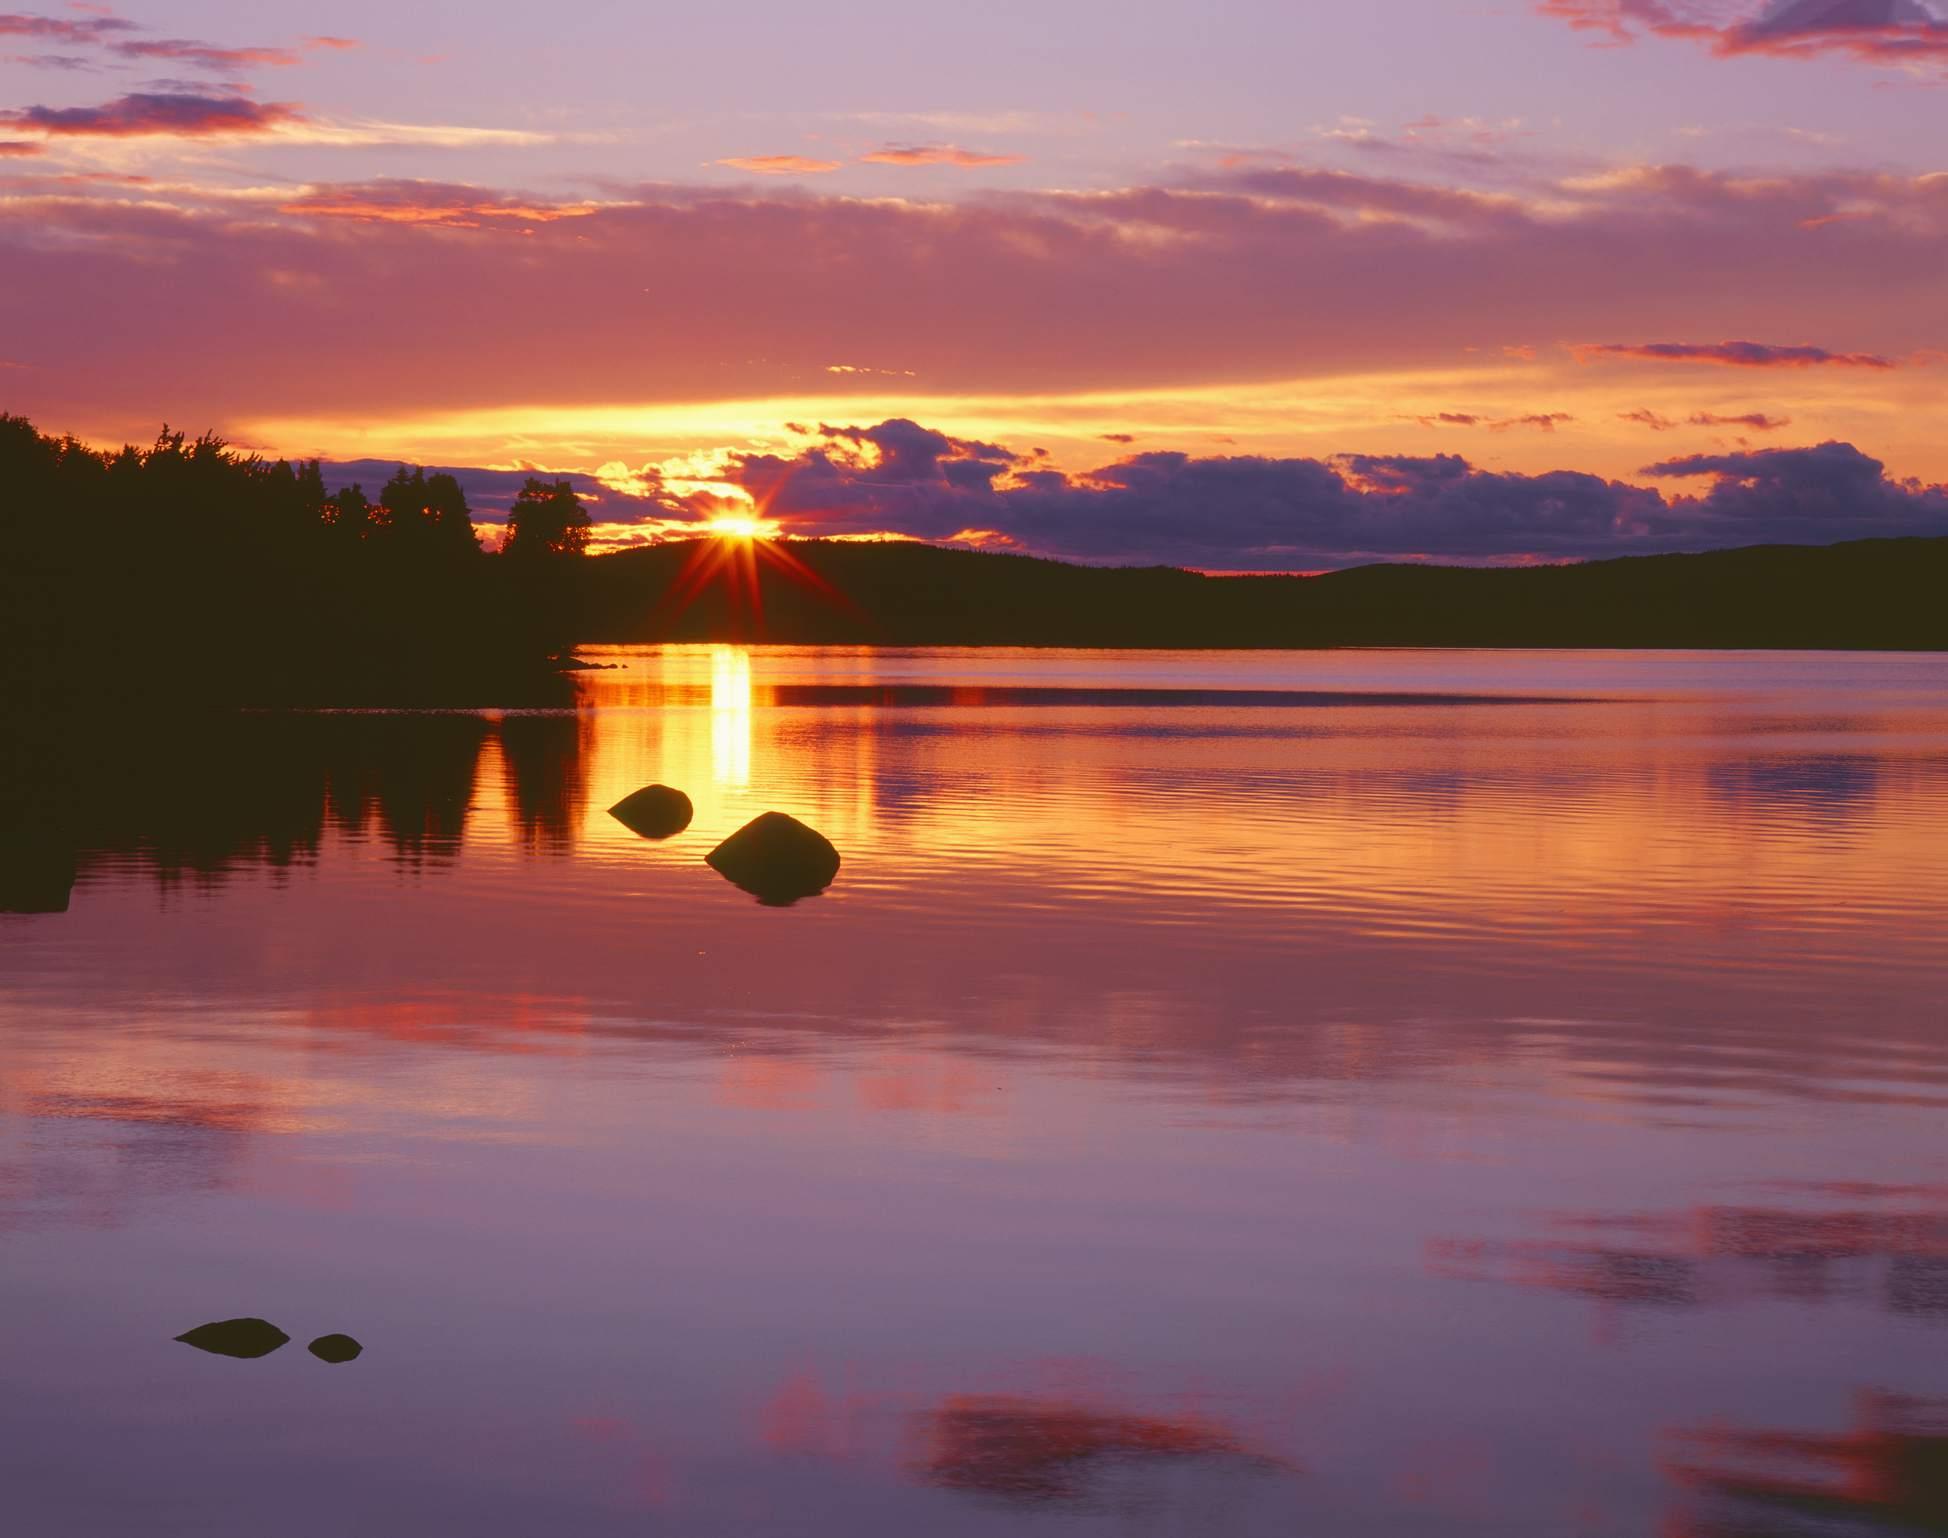 Sunset at Alexander Bay